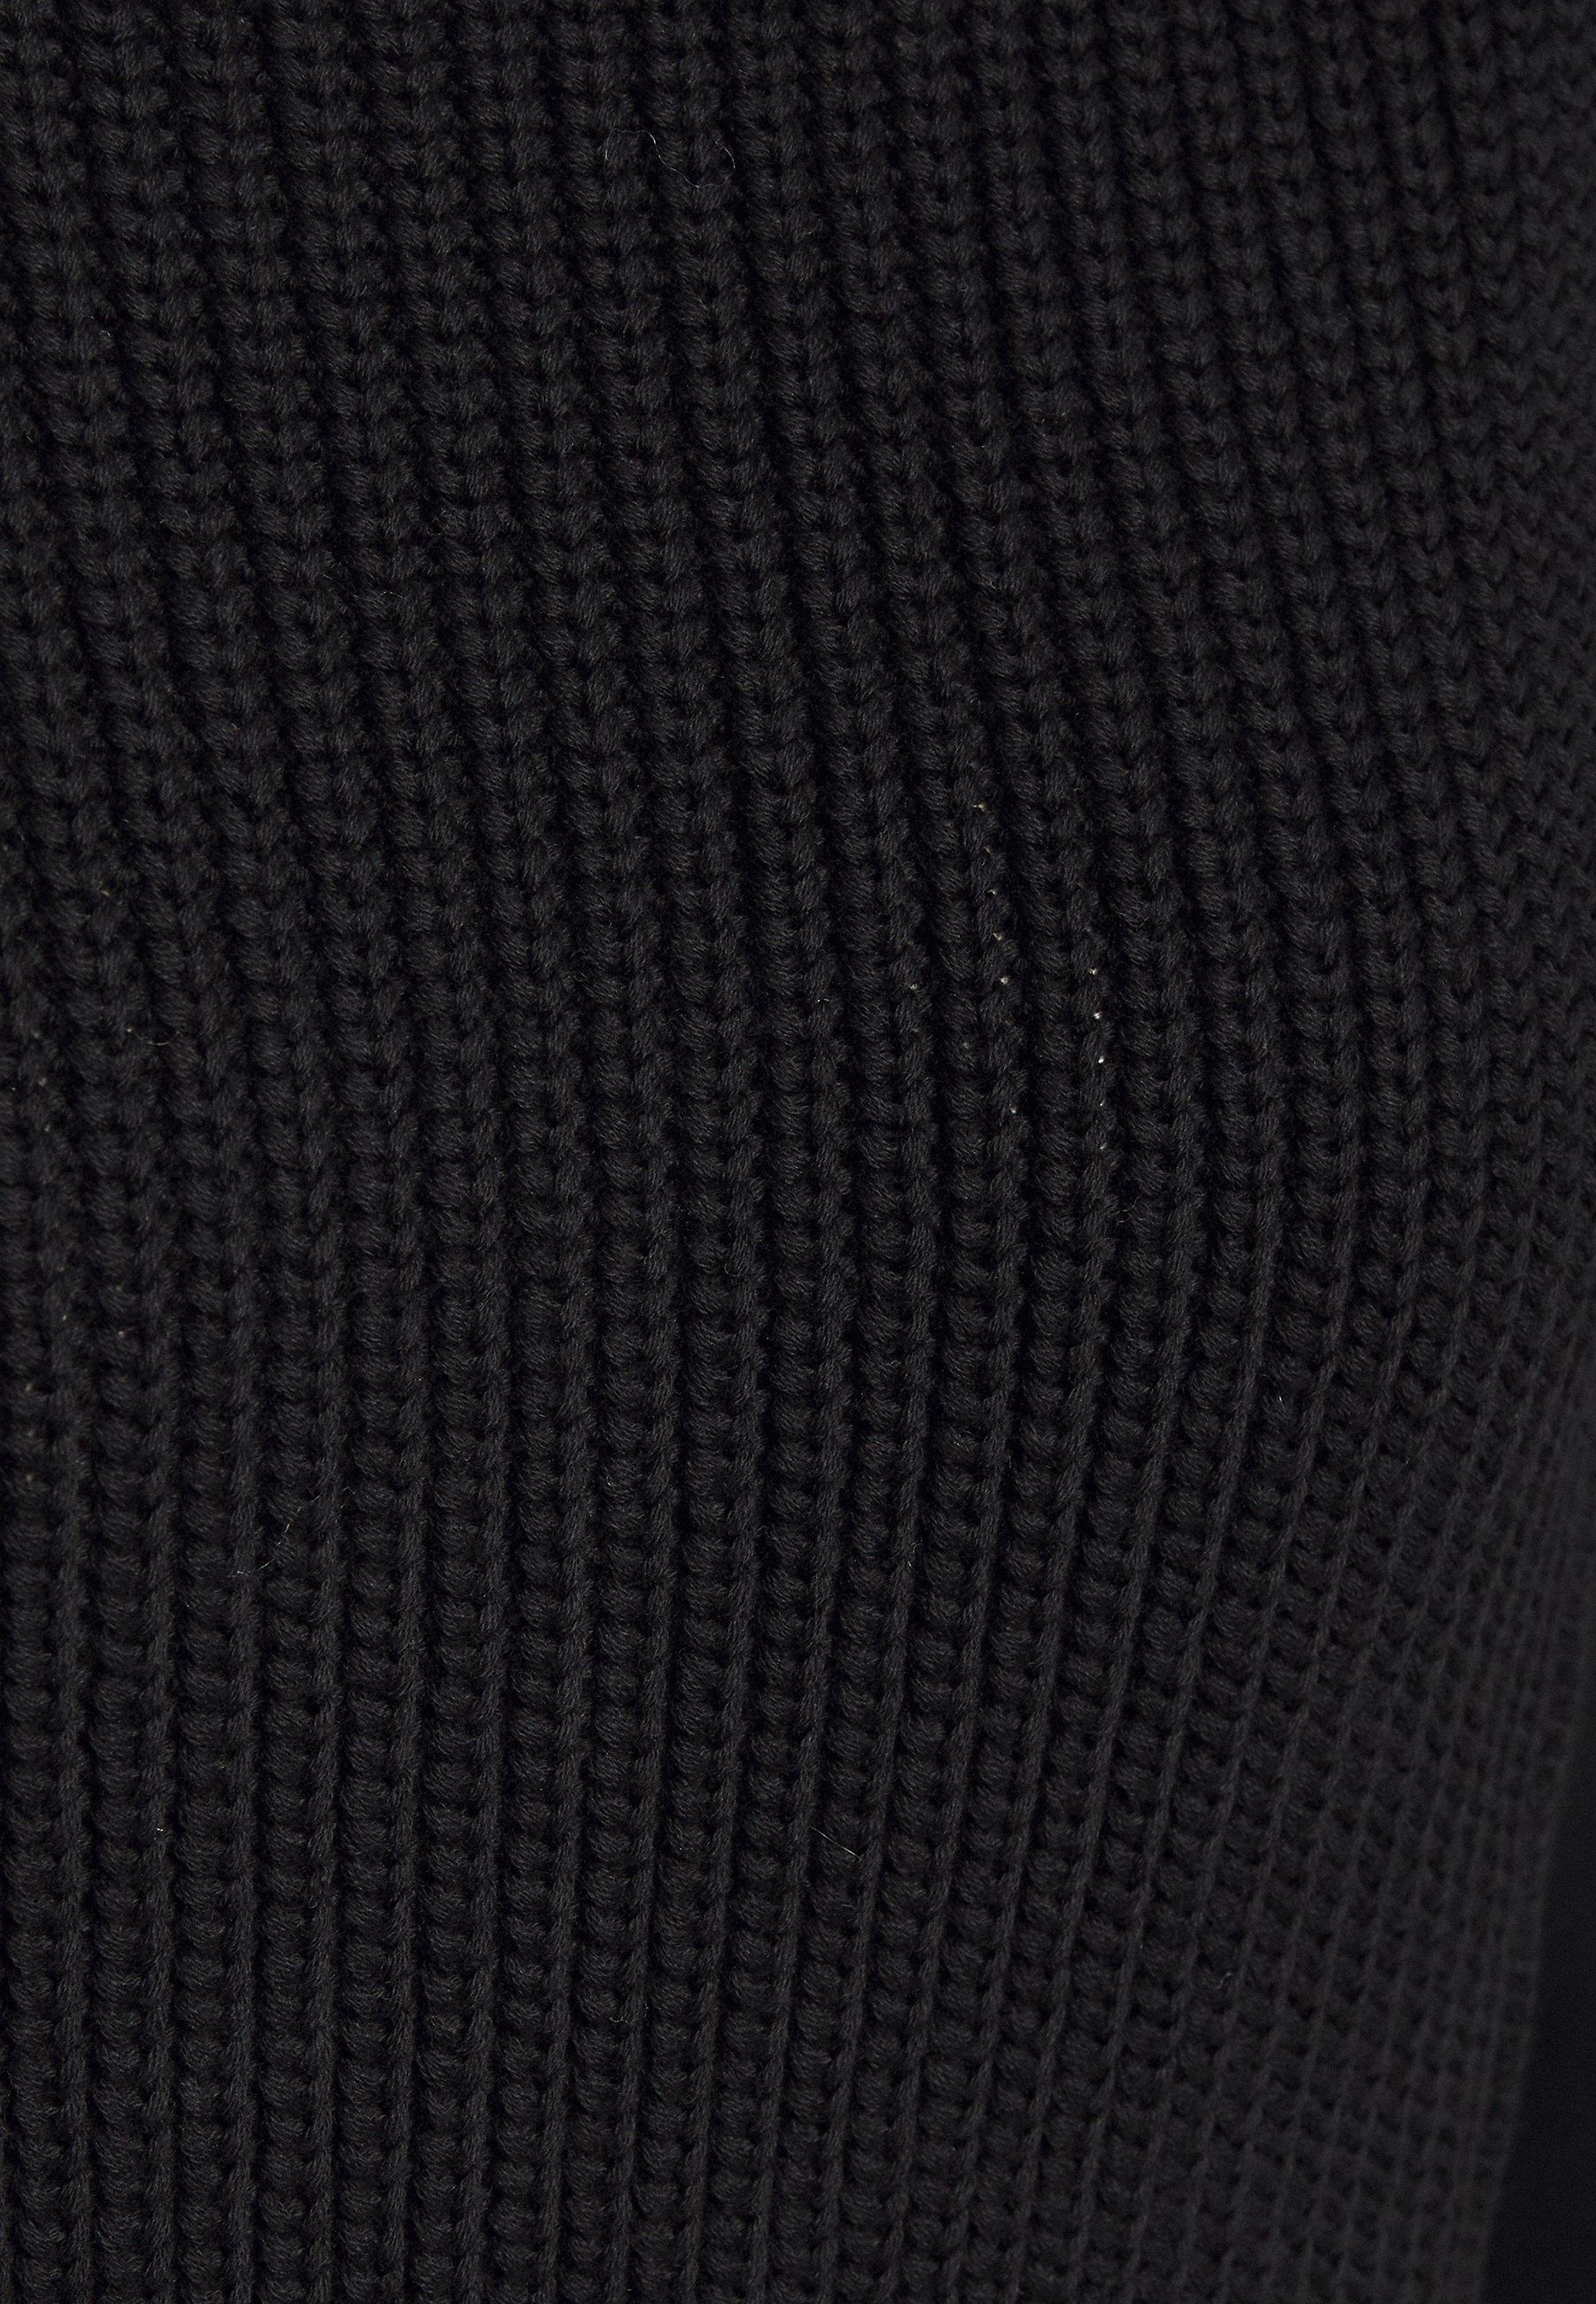 someday. QUNOLA Jerseykleid black/schwarz